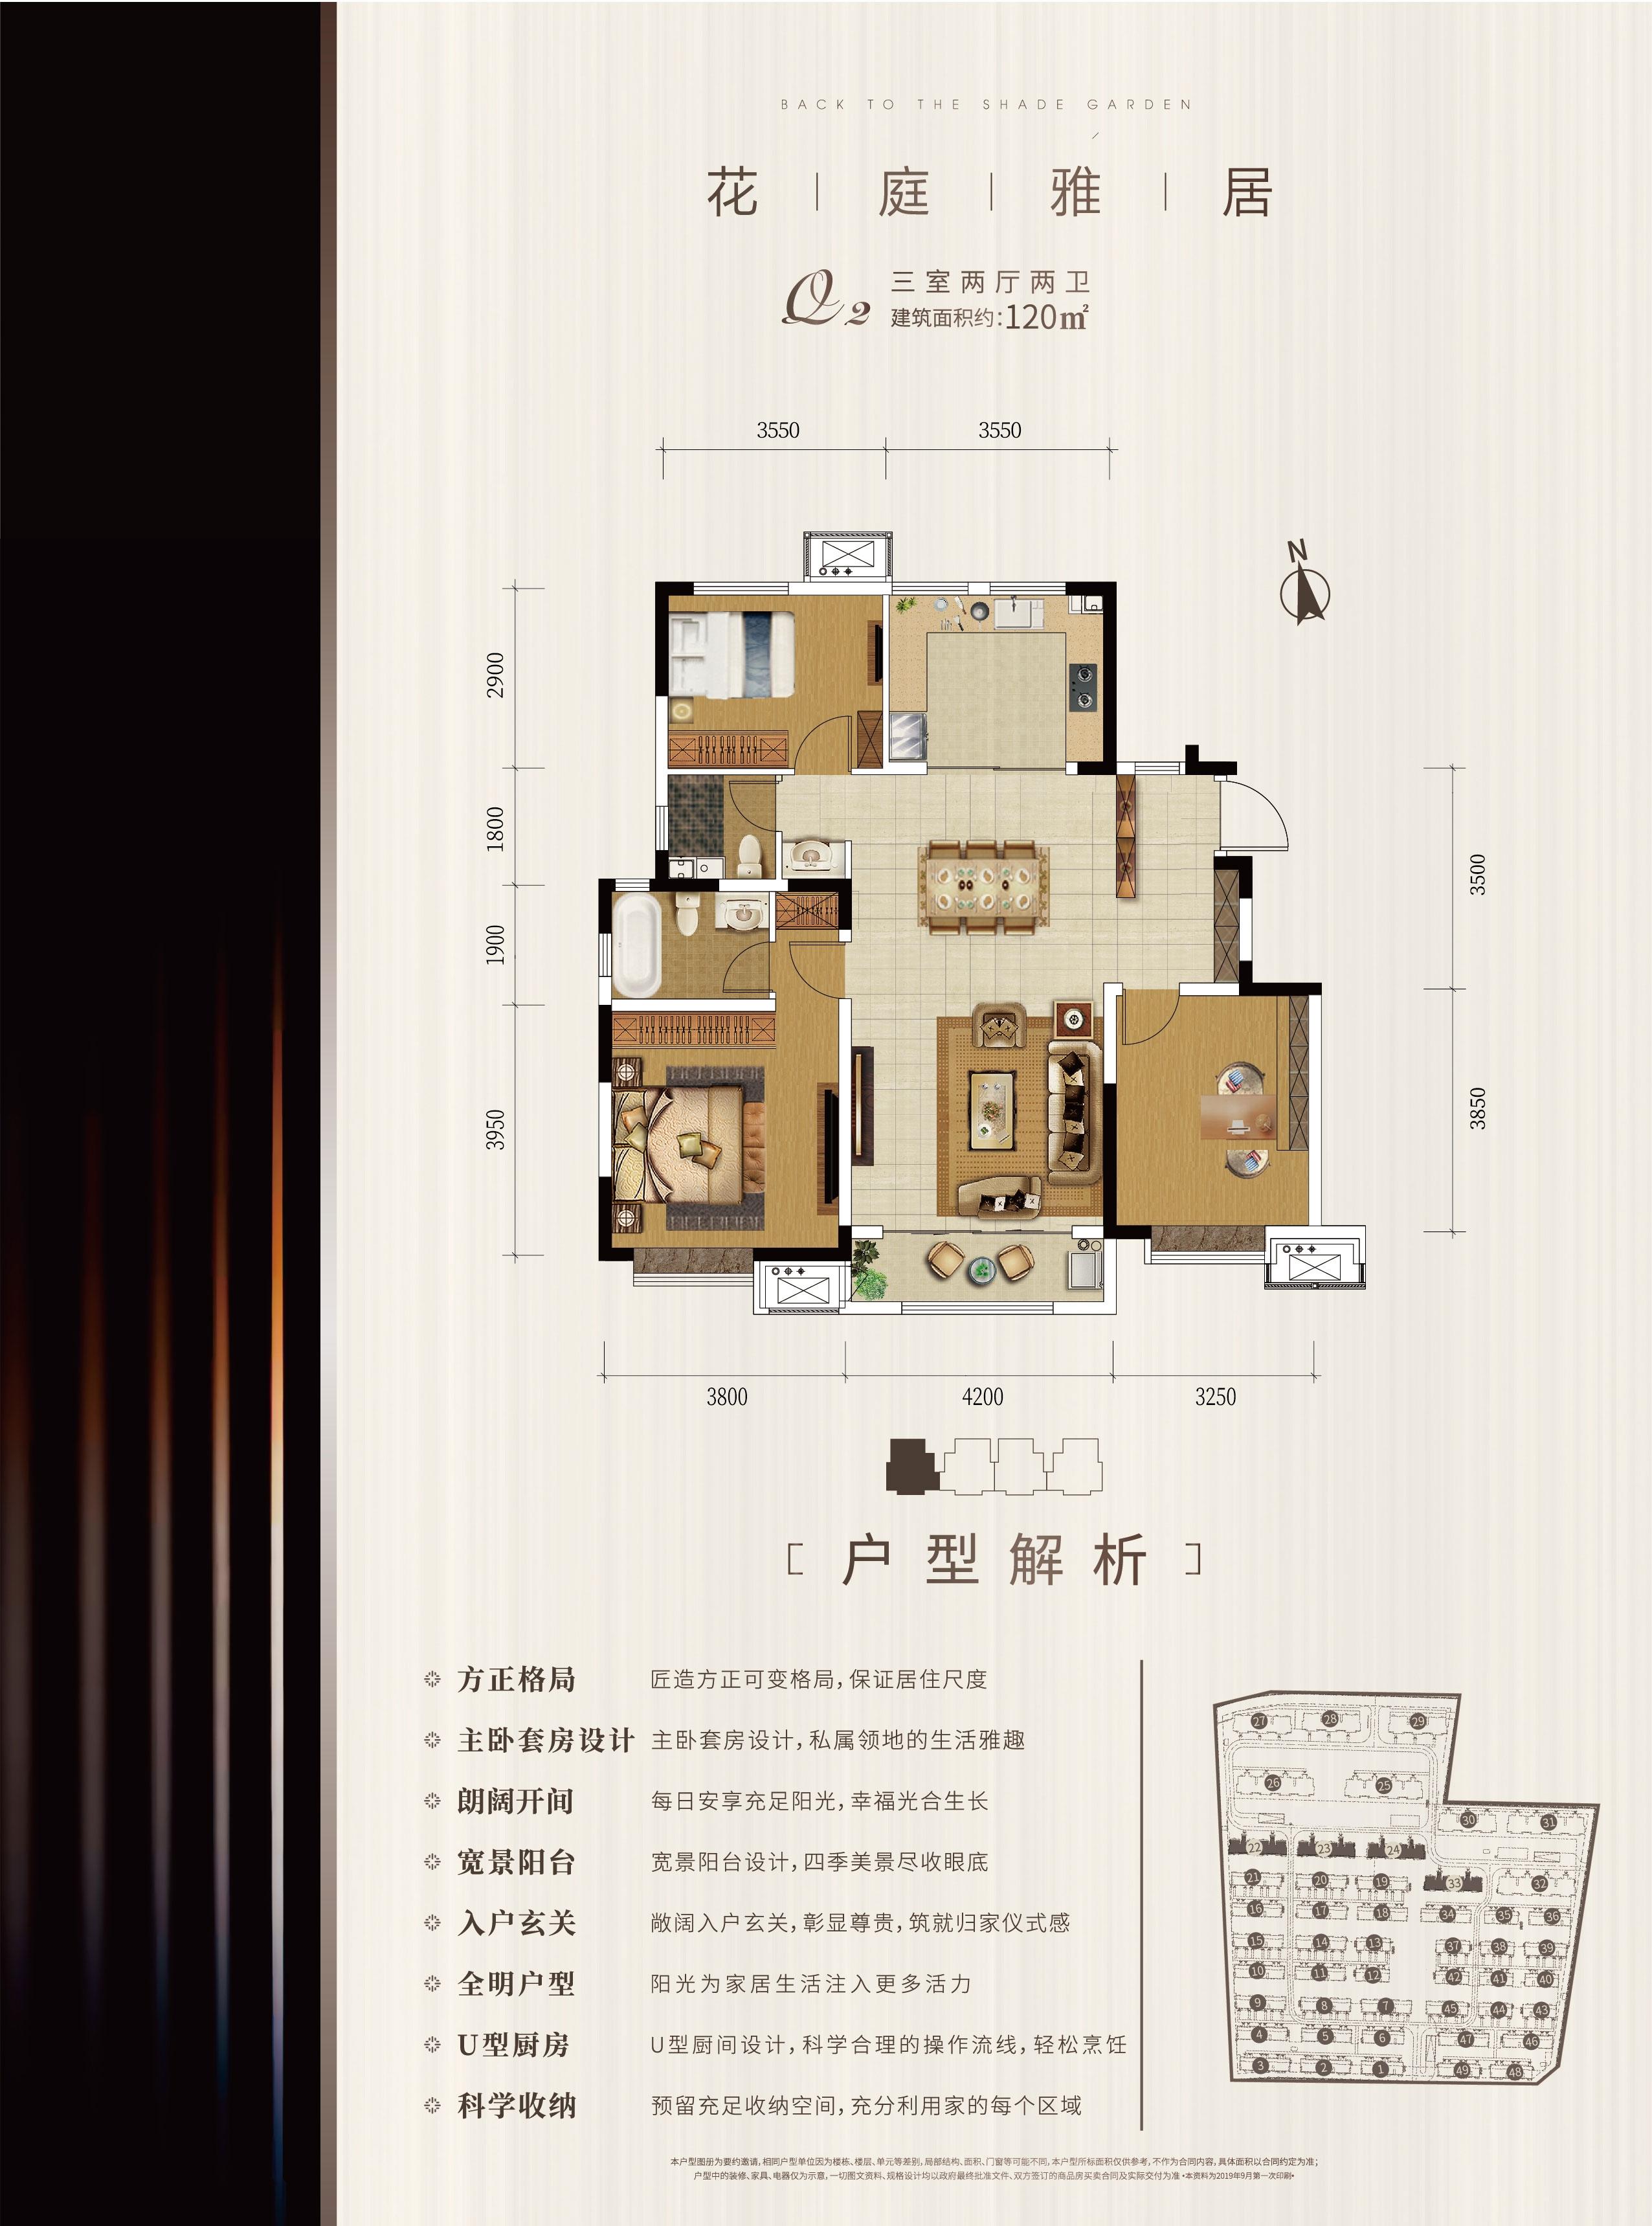 Q2户型 三室两厅两卫 120平米